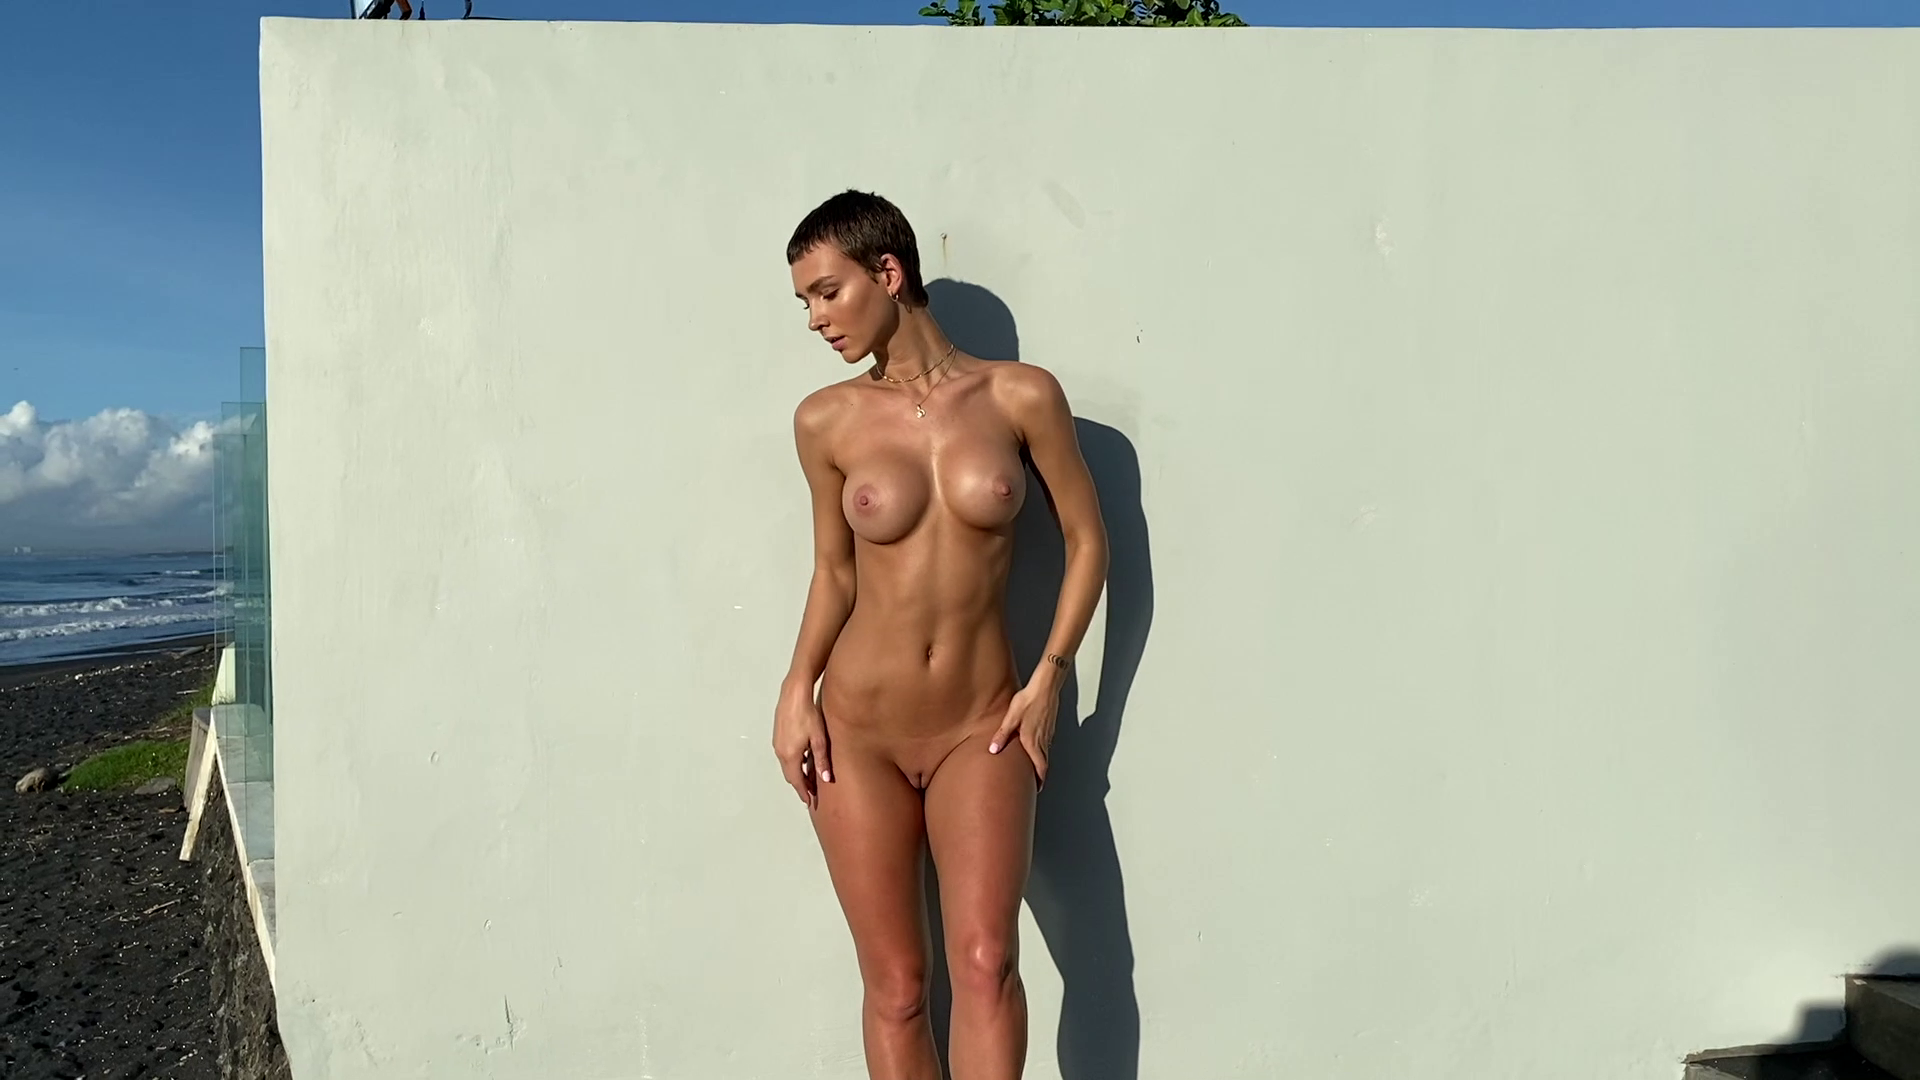 Nude photos of dane cook